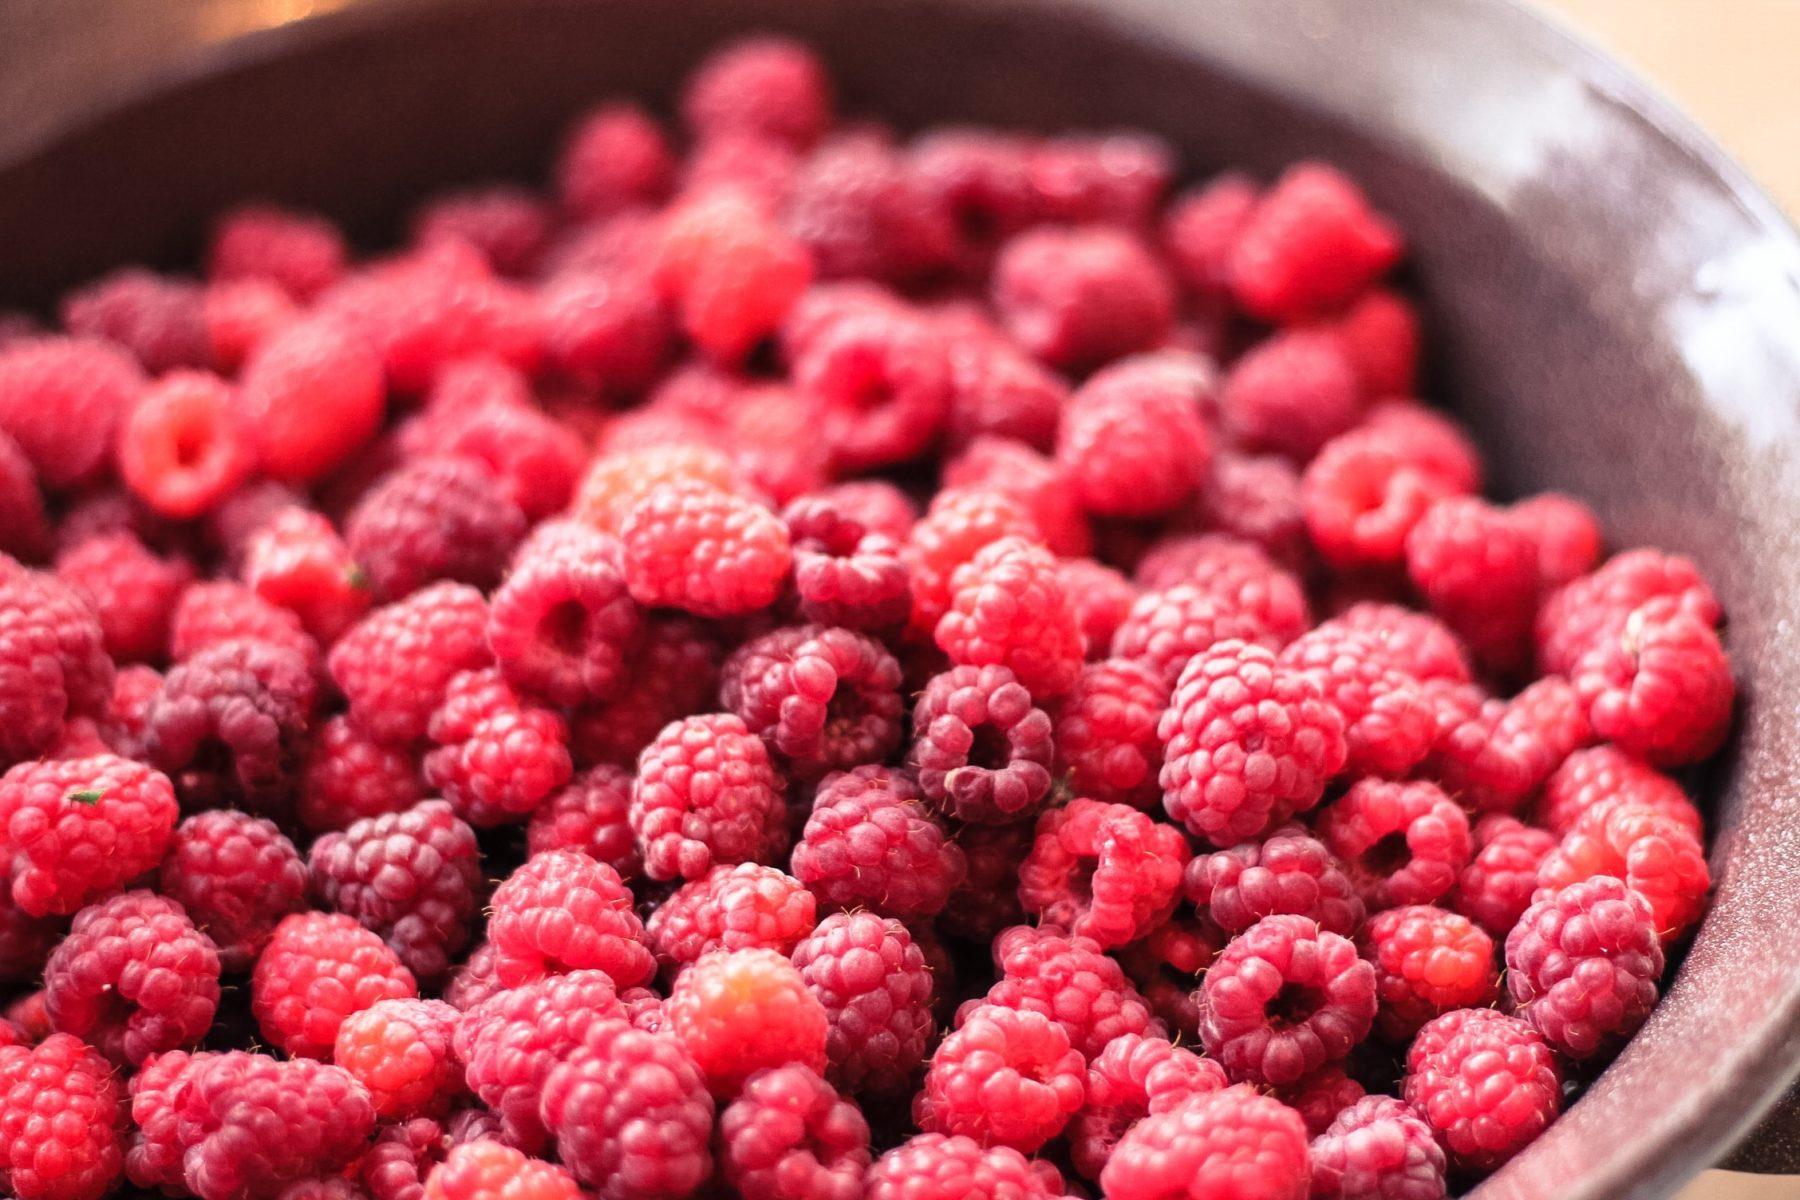 raspberry-690205